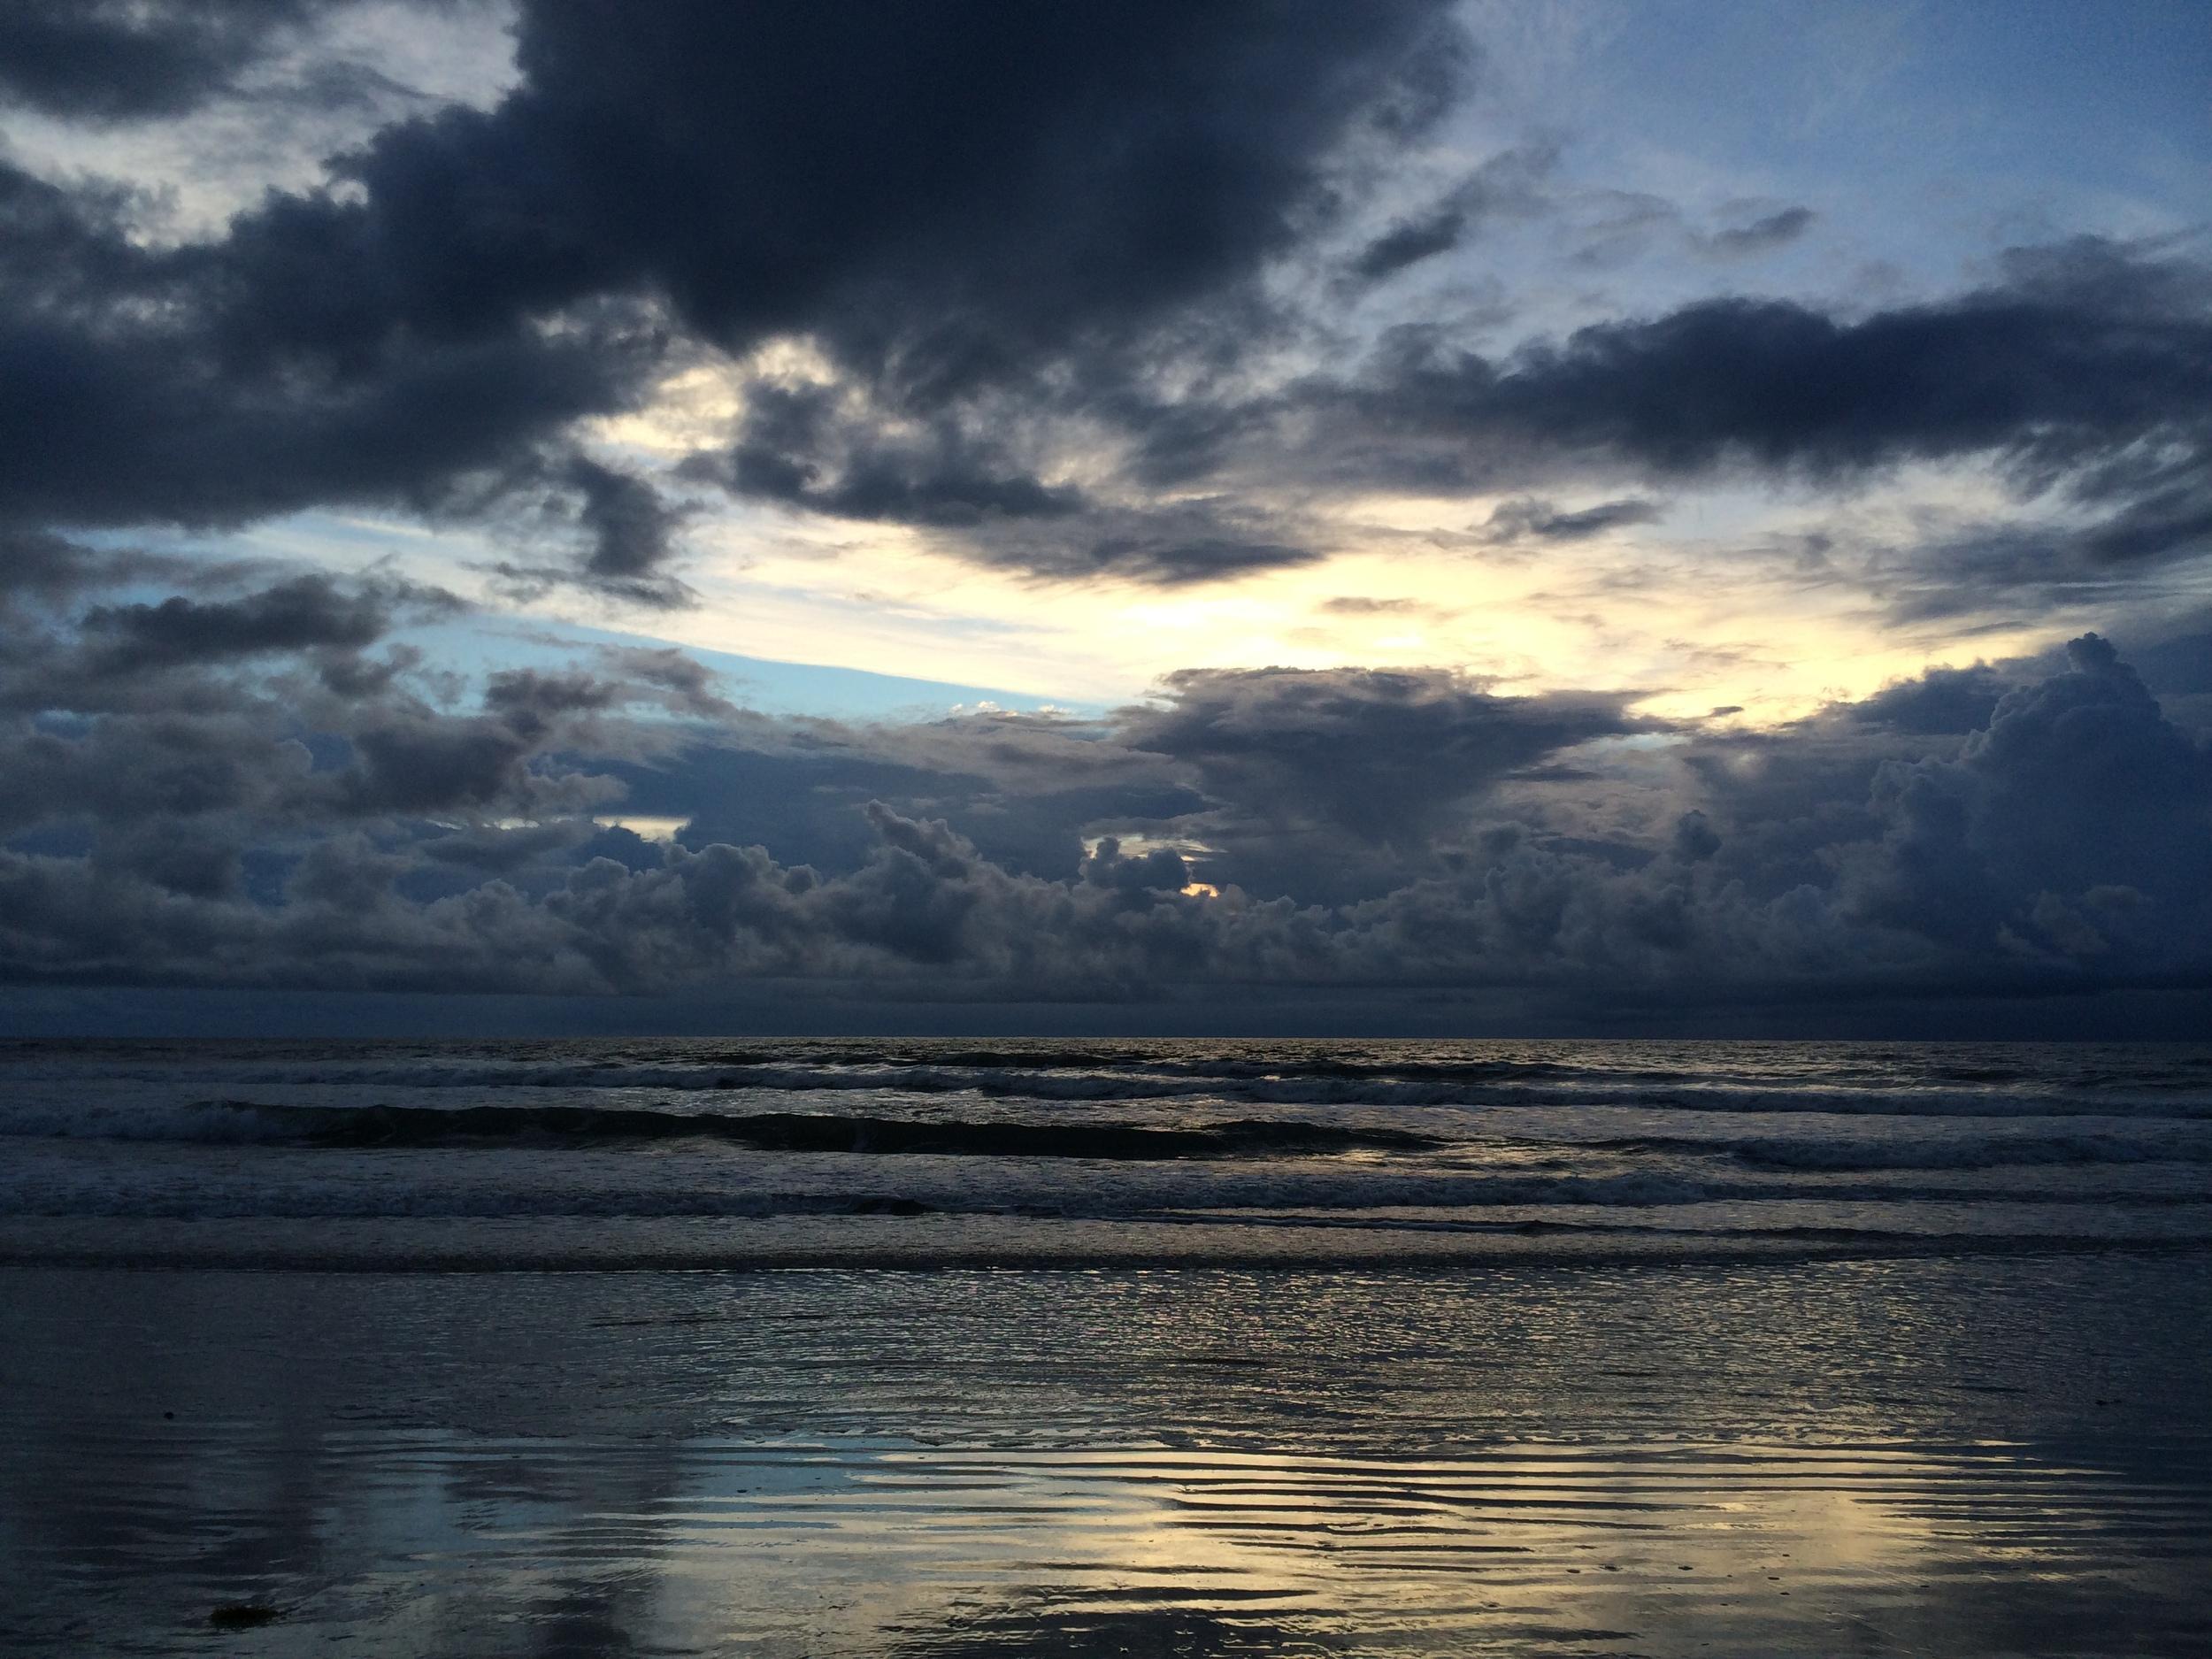 Storm at Dawn, St. Augustine, FL 2014